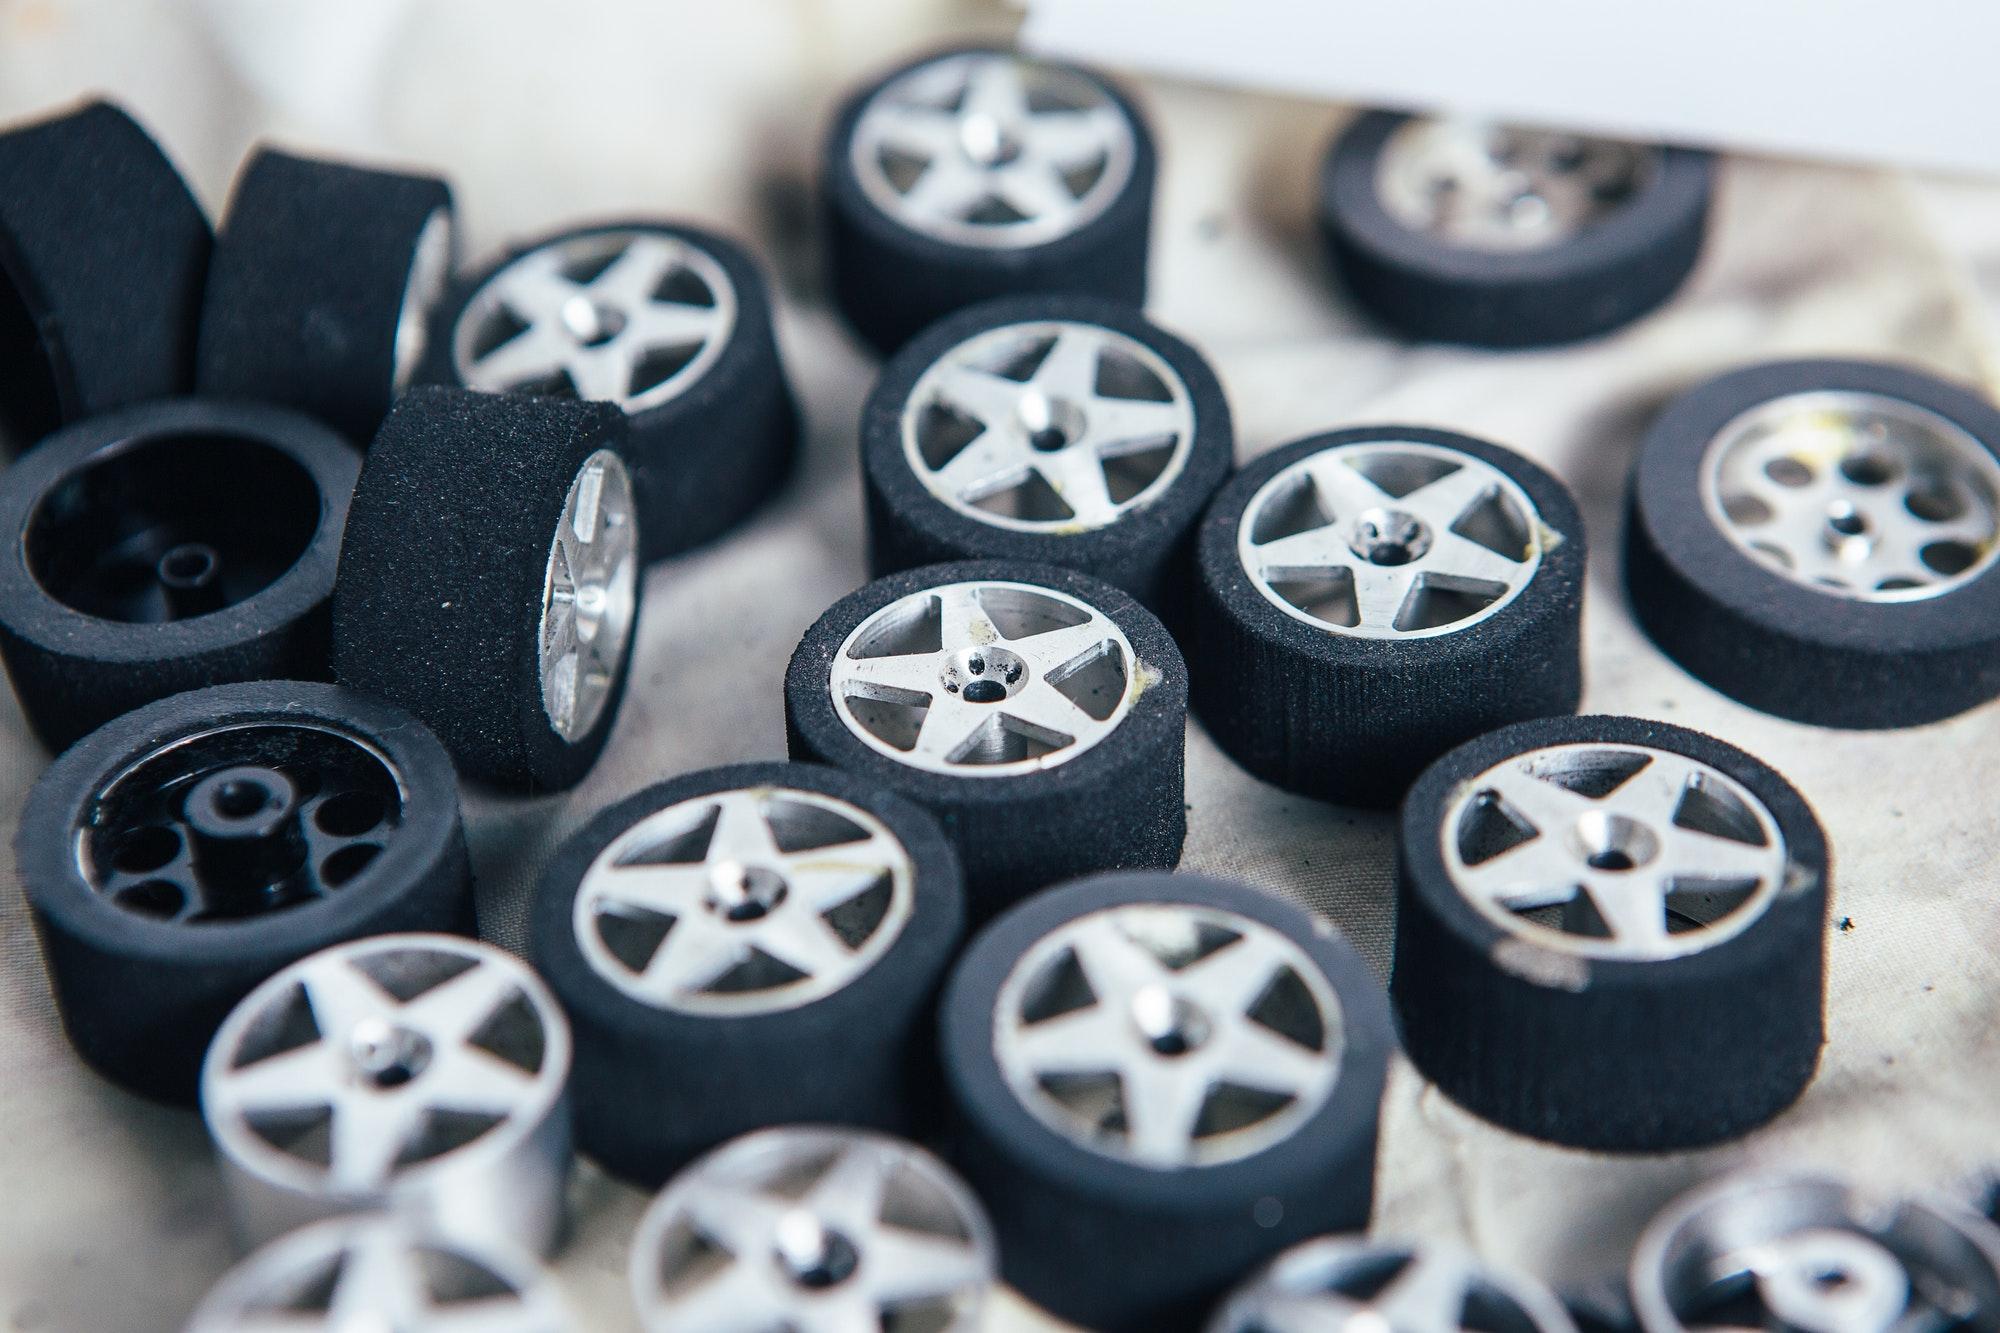 Ruedas para coches en Las Palmas, neumáticos km zero